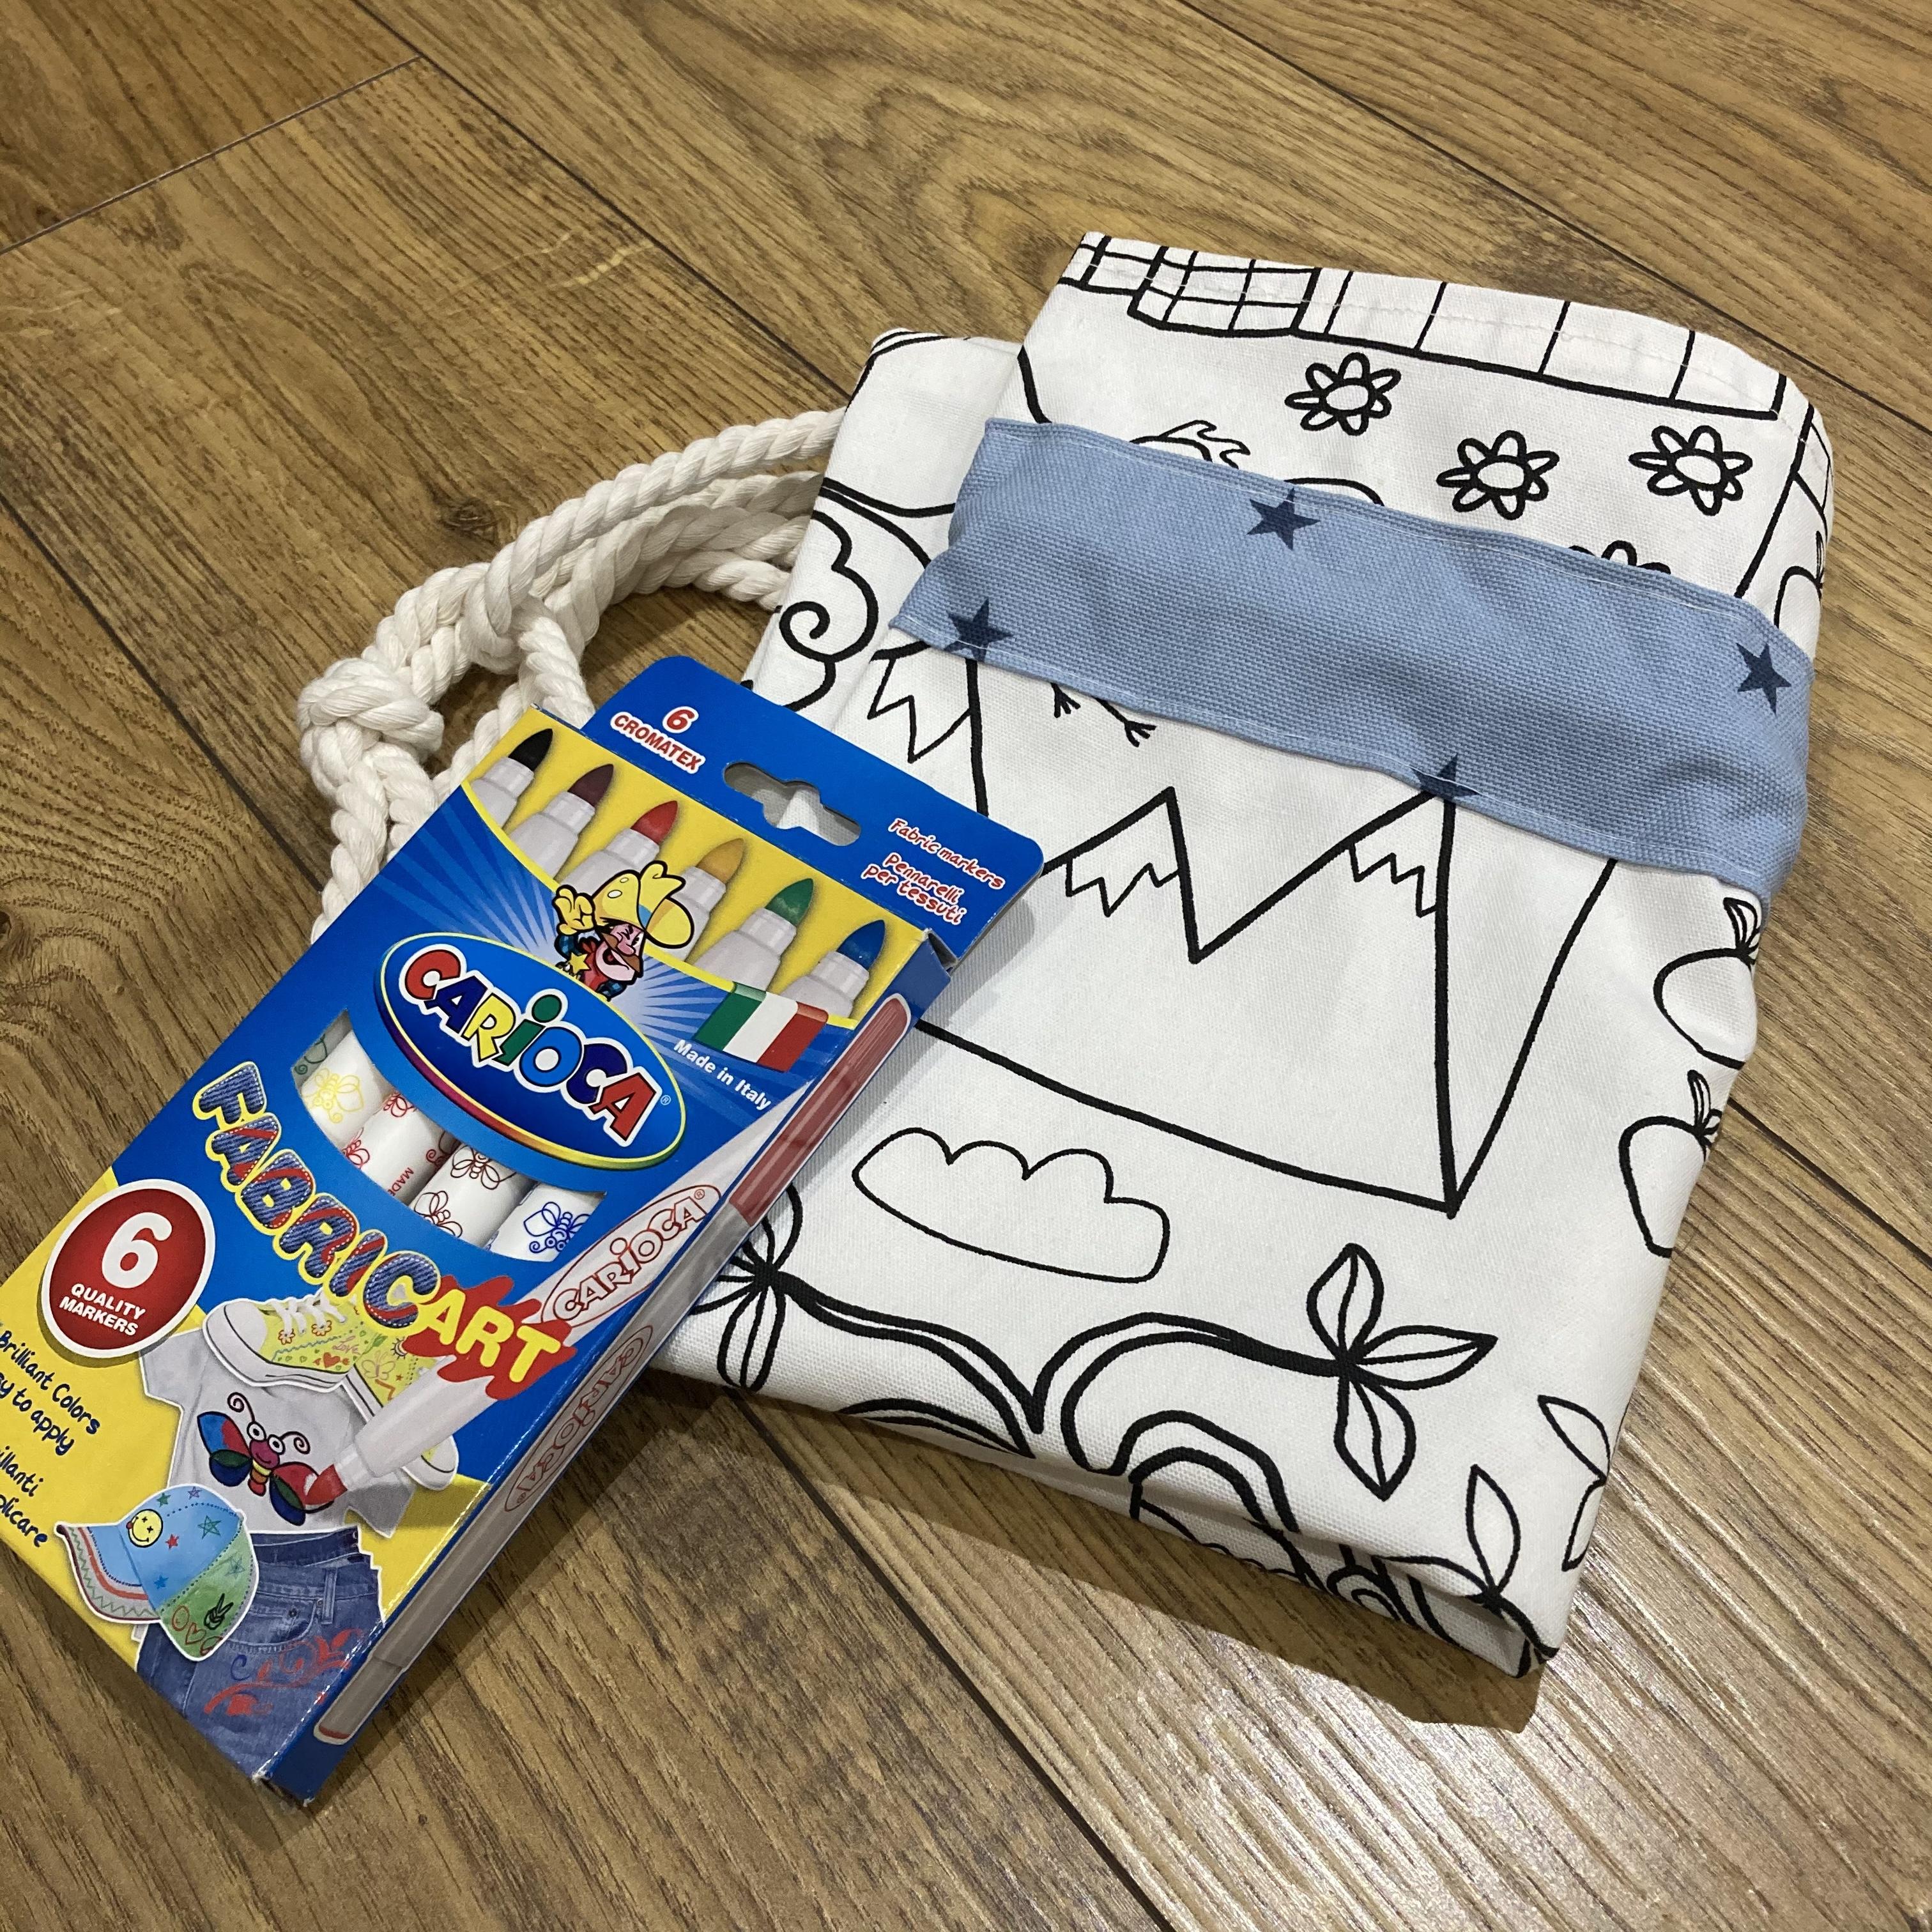 Colour-me-in Drawstring bag